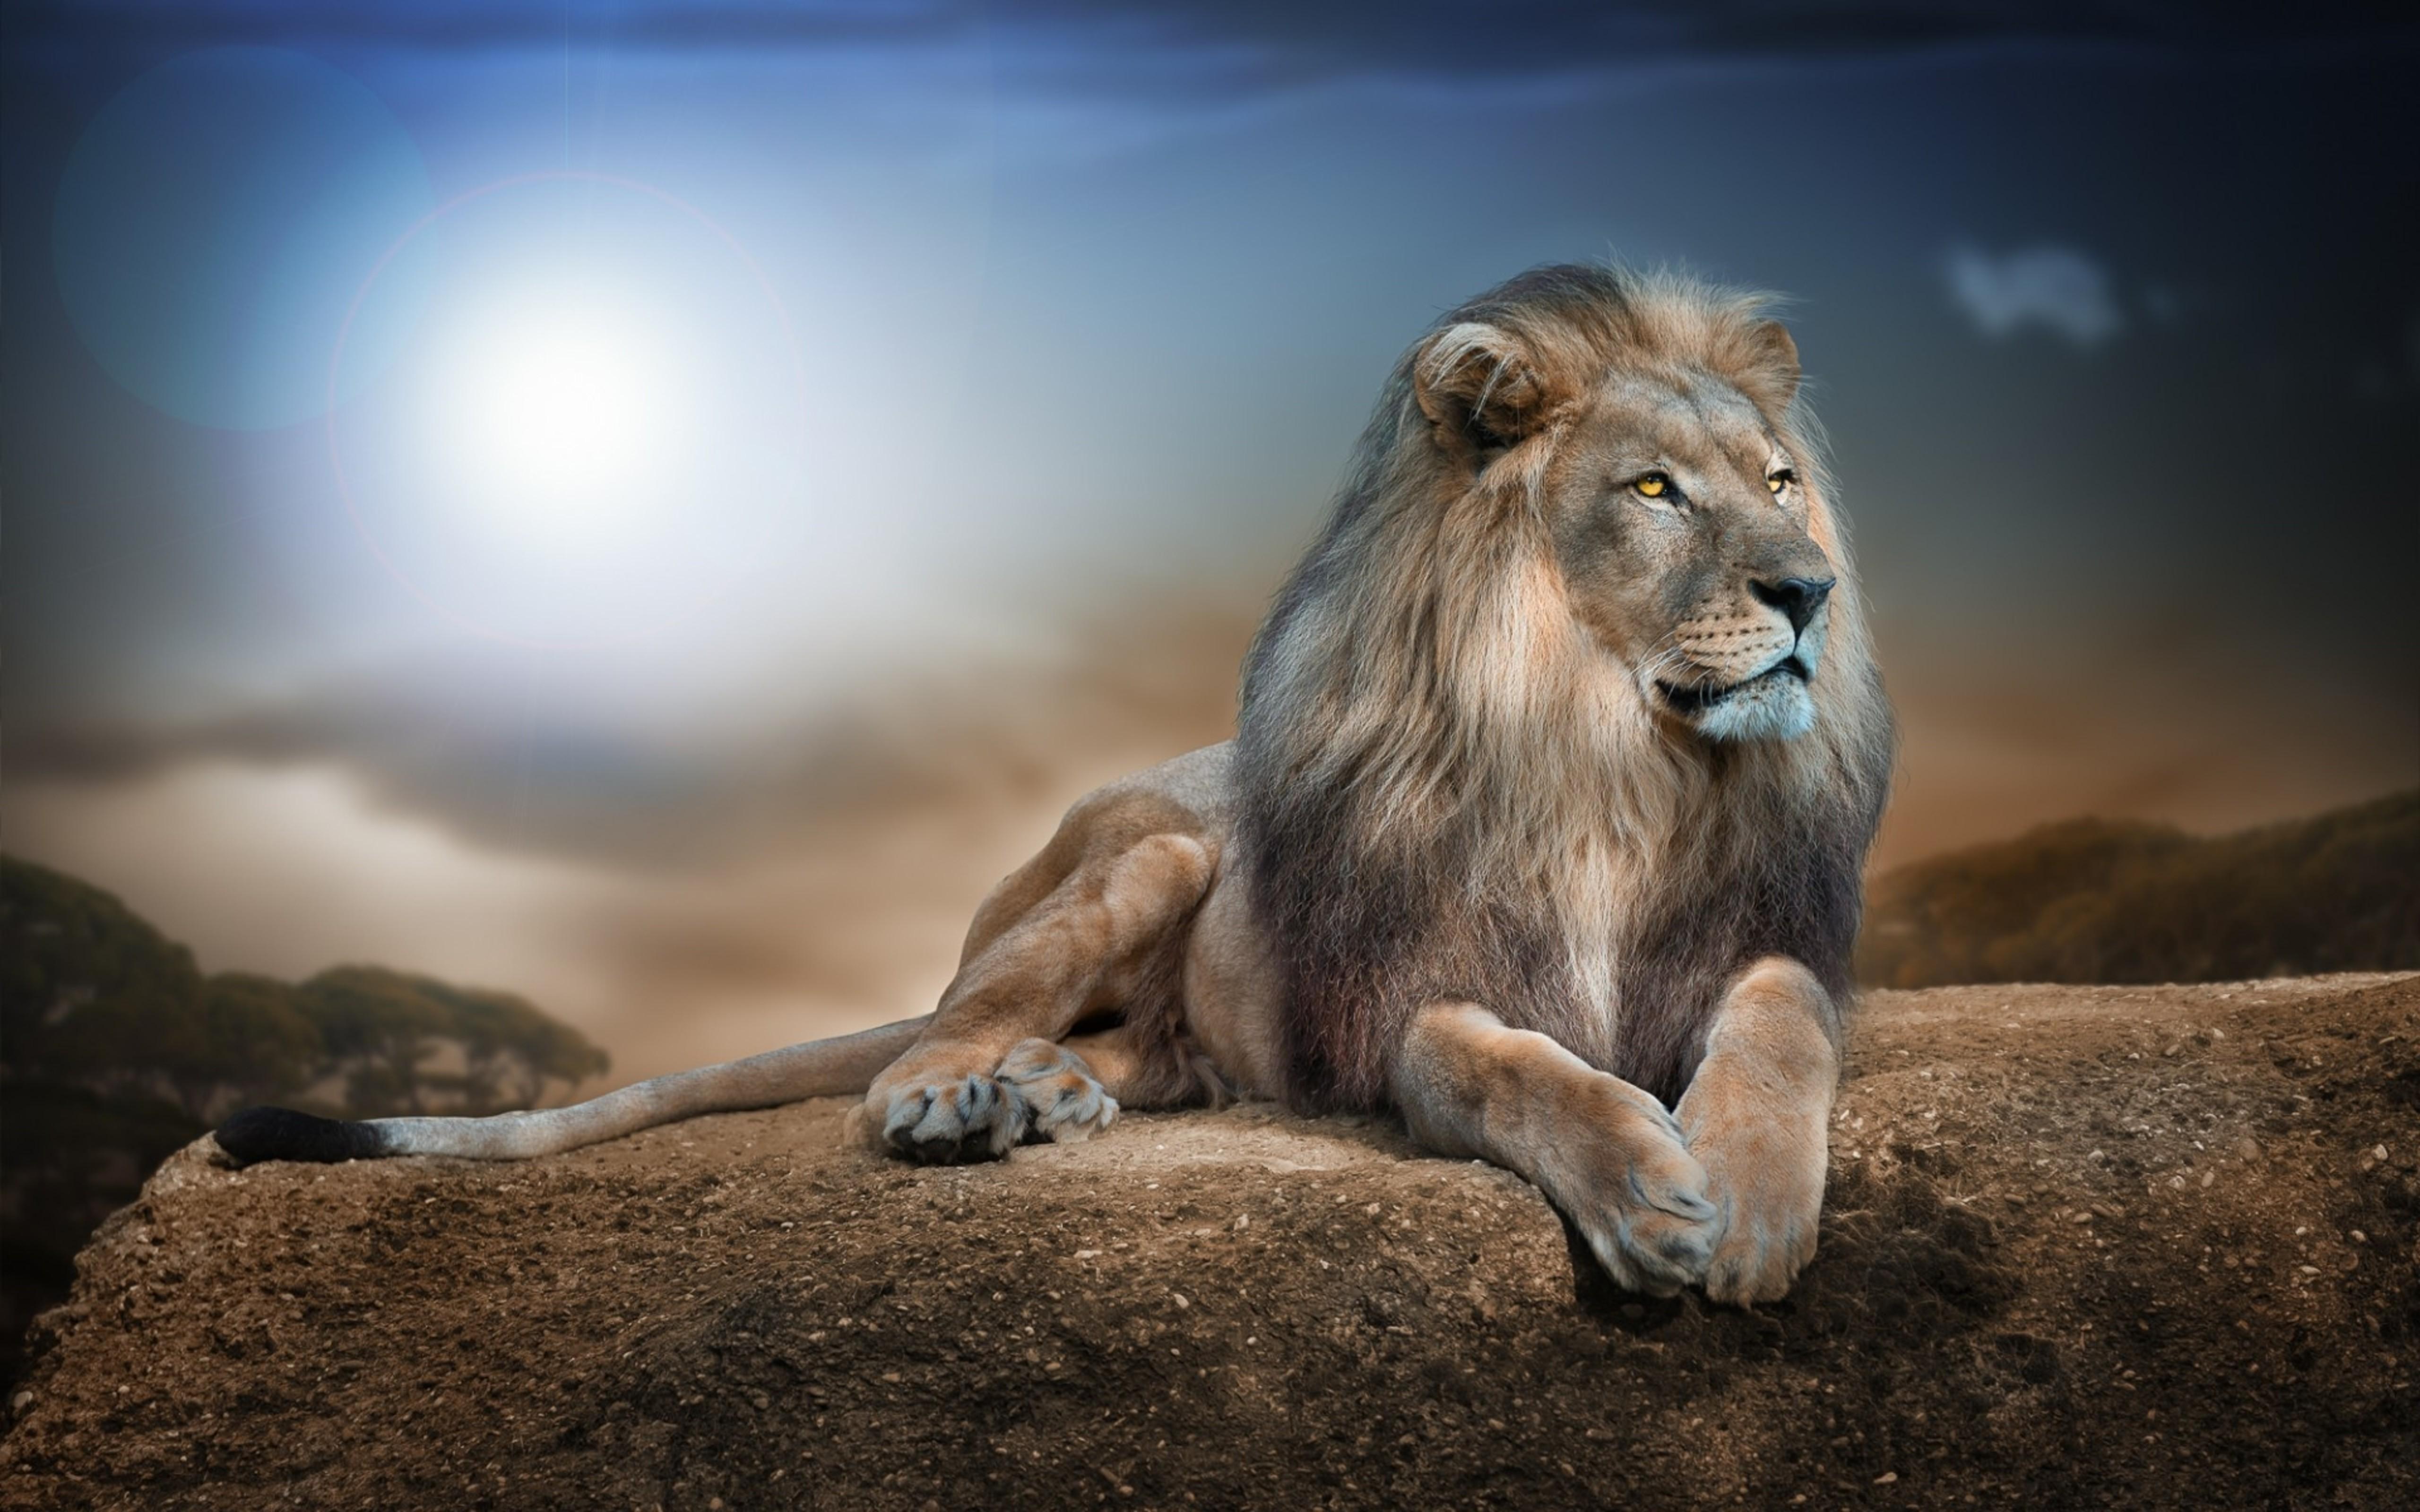 Image: Lion, predator, mane, muzzle, head, eyes, view, feet, tail, lie, hills, sky, lie